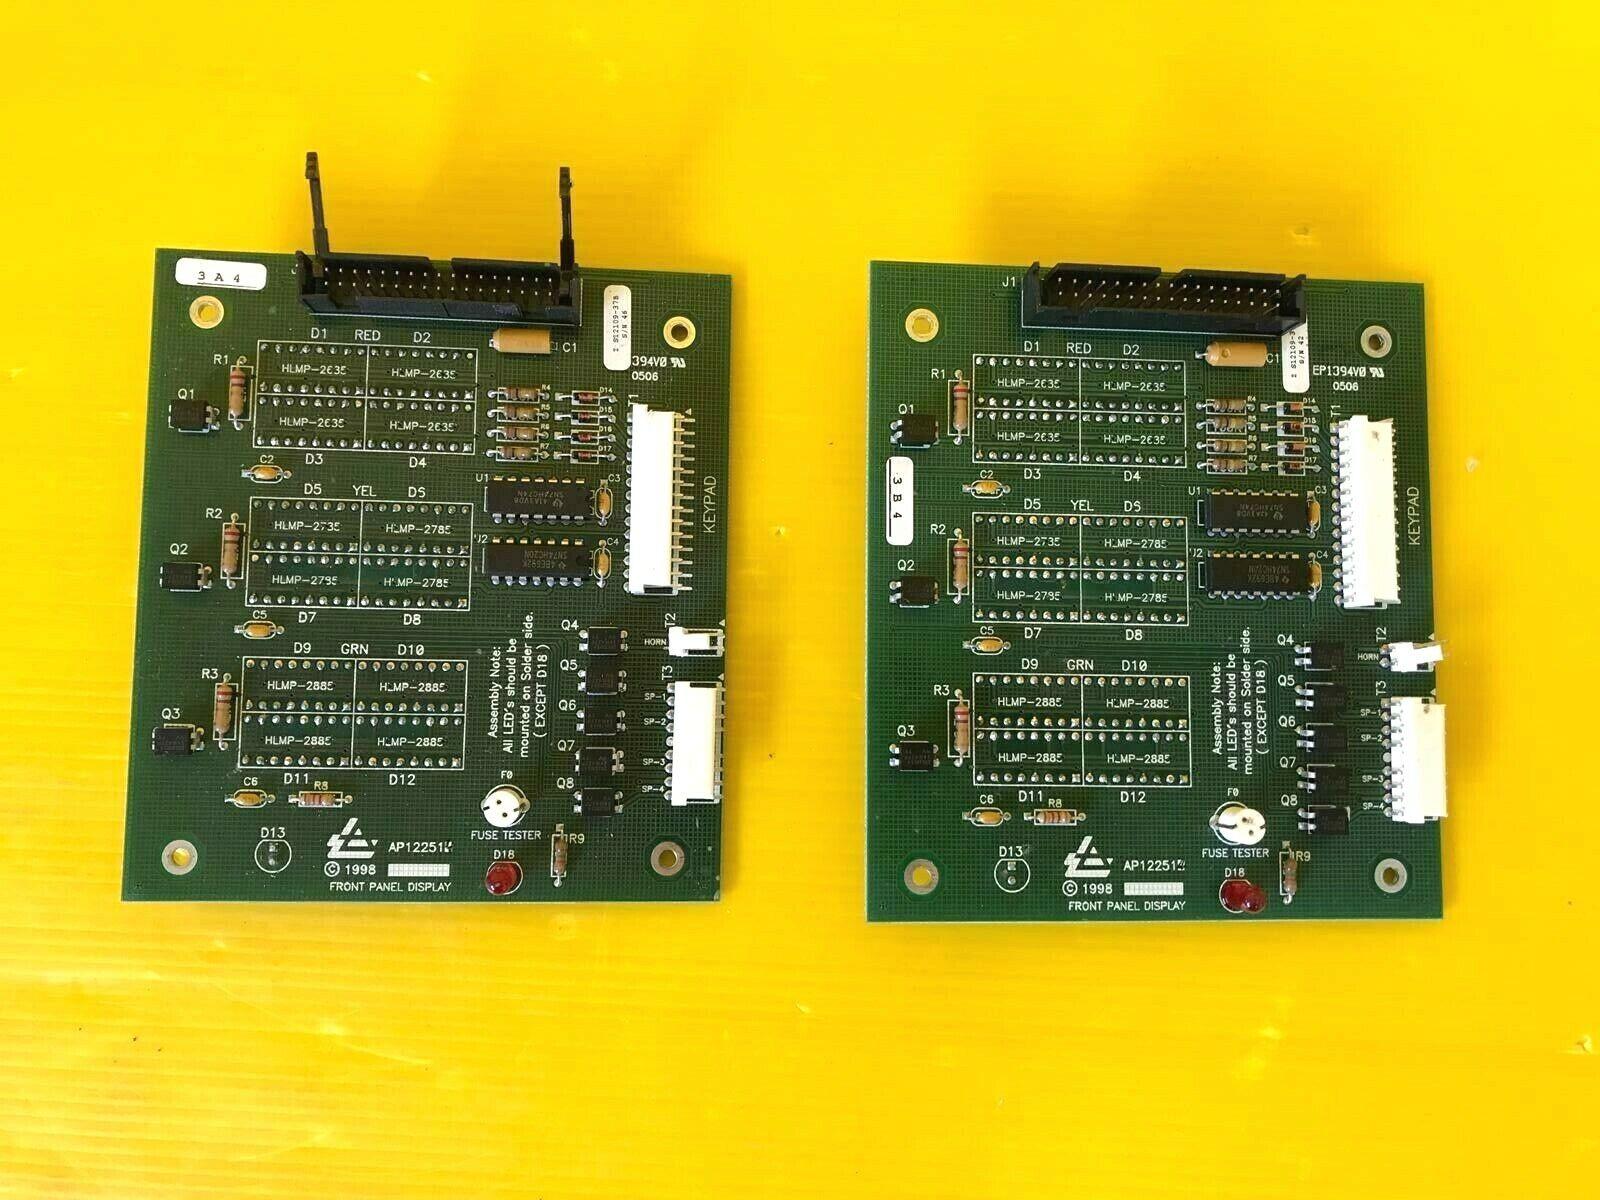 2PCS Air Products AP12251 Front Panel Display Board PCB